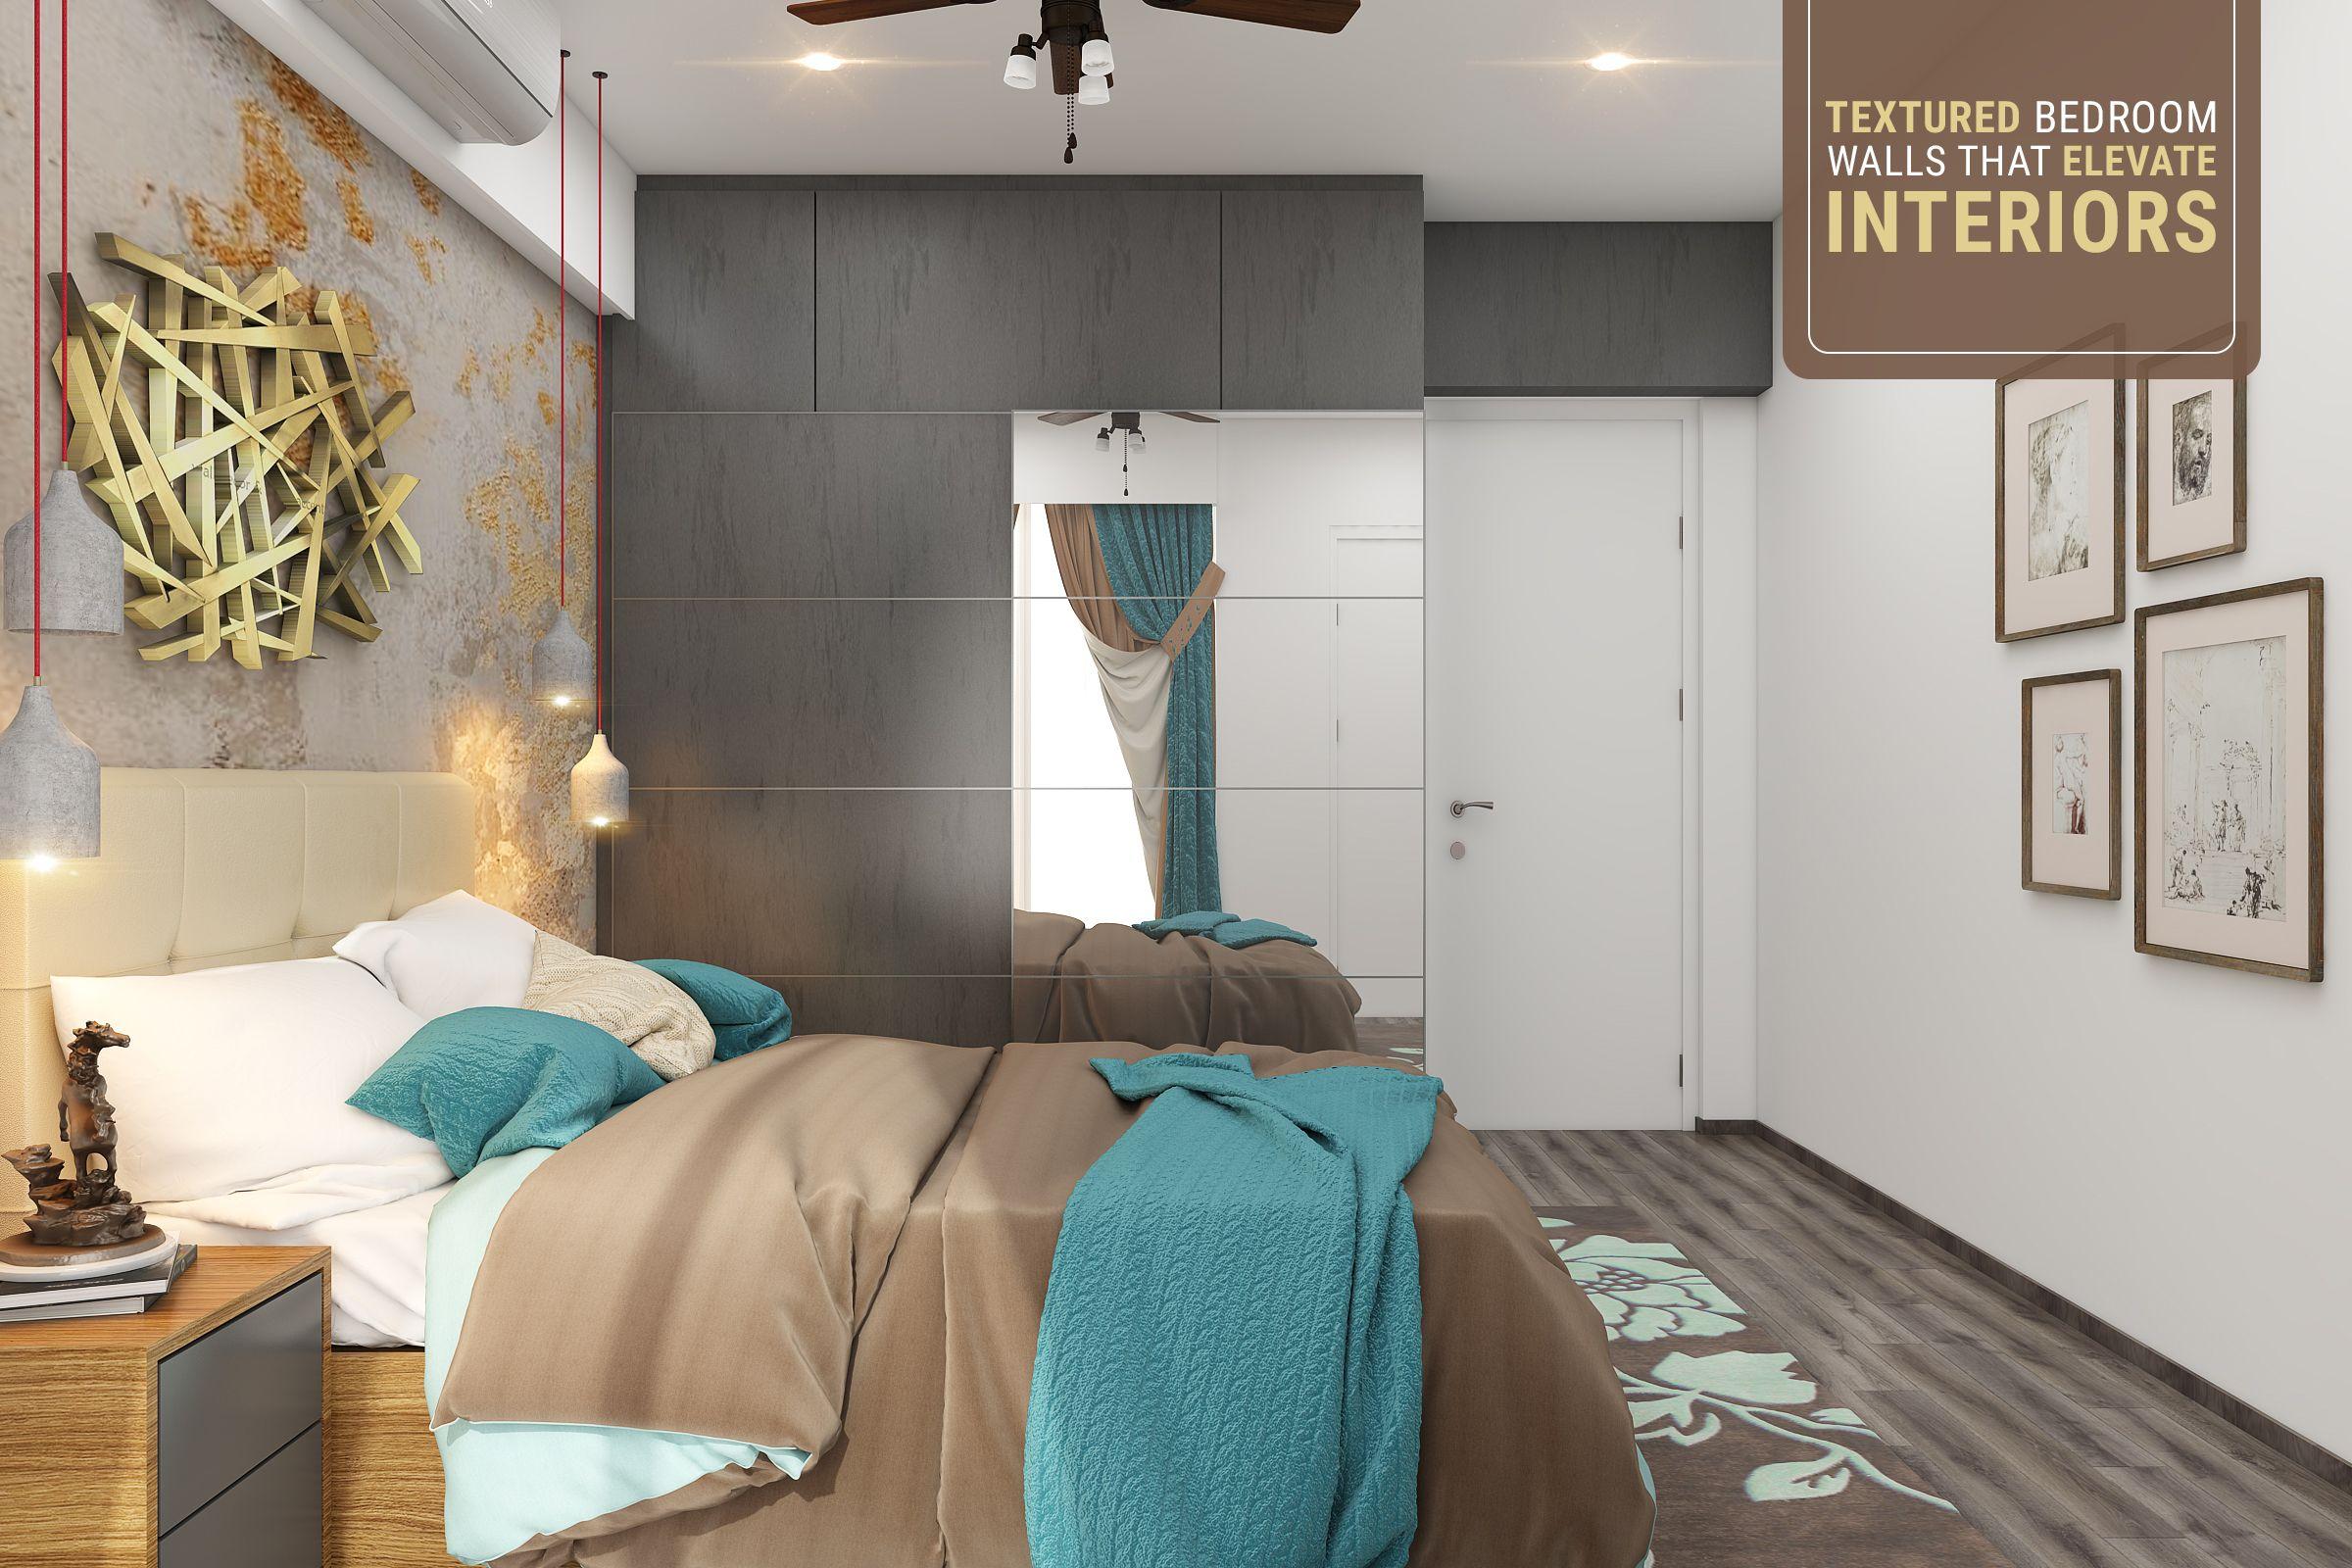 Glamor is attractive, glamor turns heads. It's my style that I channel in  whatever I do. Glamor … | Bedroom design, Interior design bedroom, Wardrobe design  bedroom